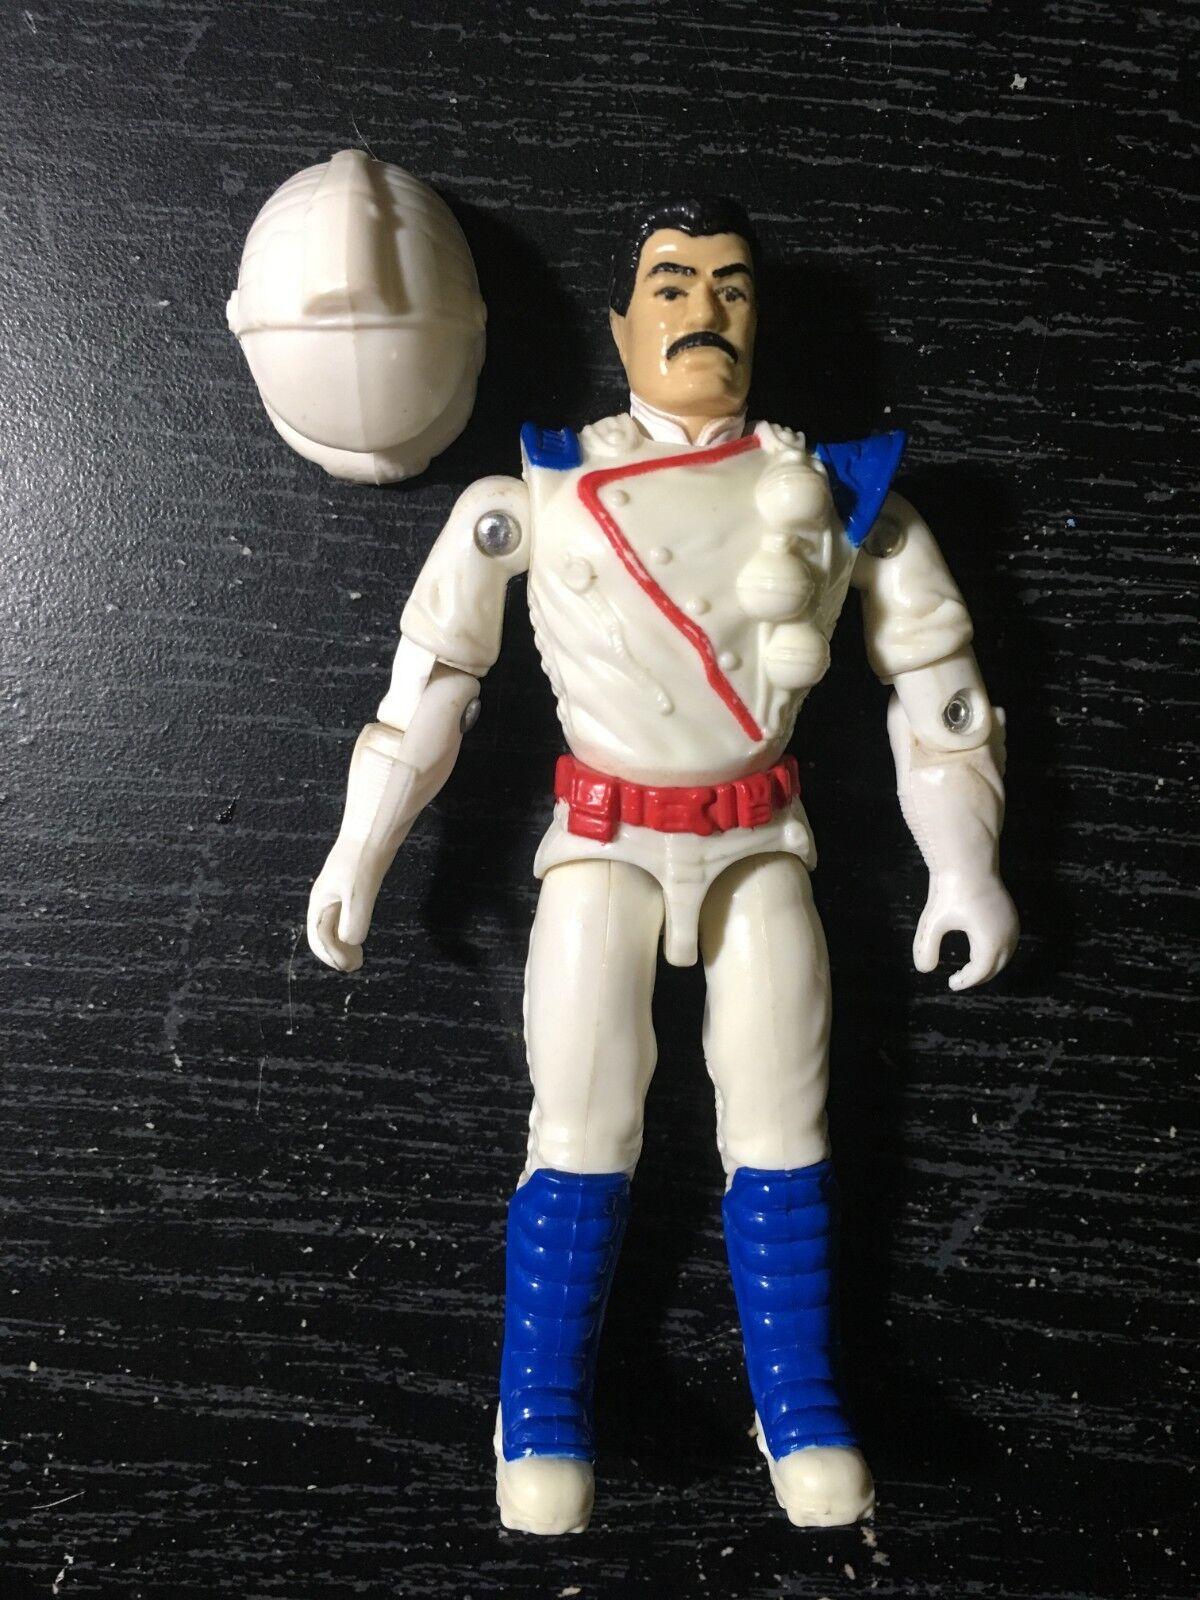 1993 Vintage GI JOE Action Figure SPACE SHOT with helmet C9 3.75  STAR BRIGADE